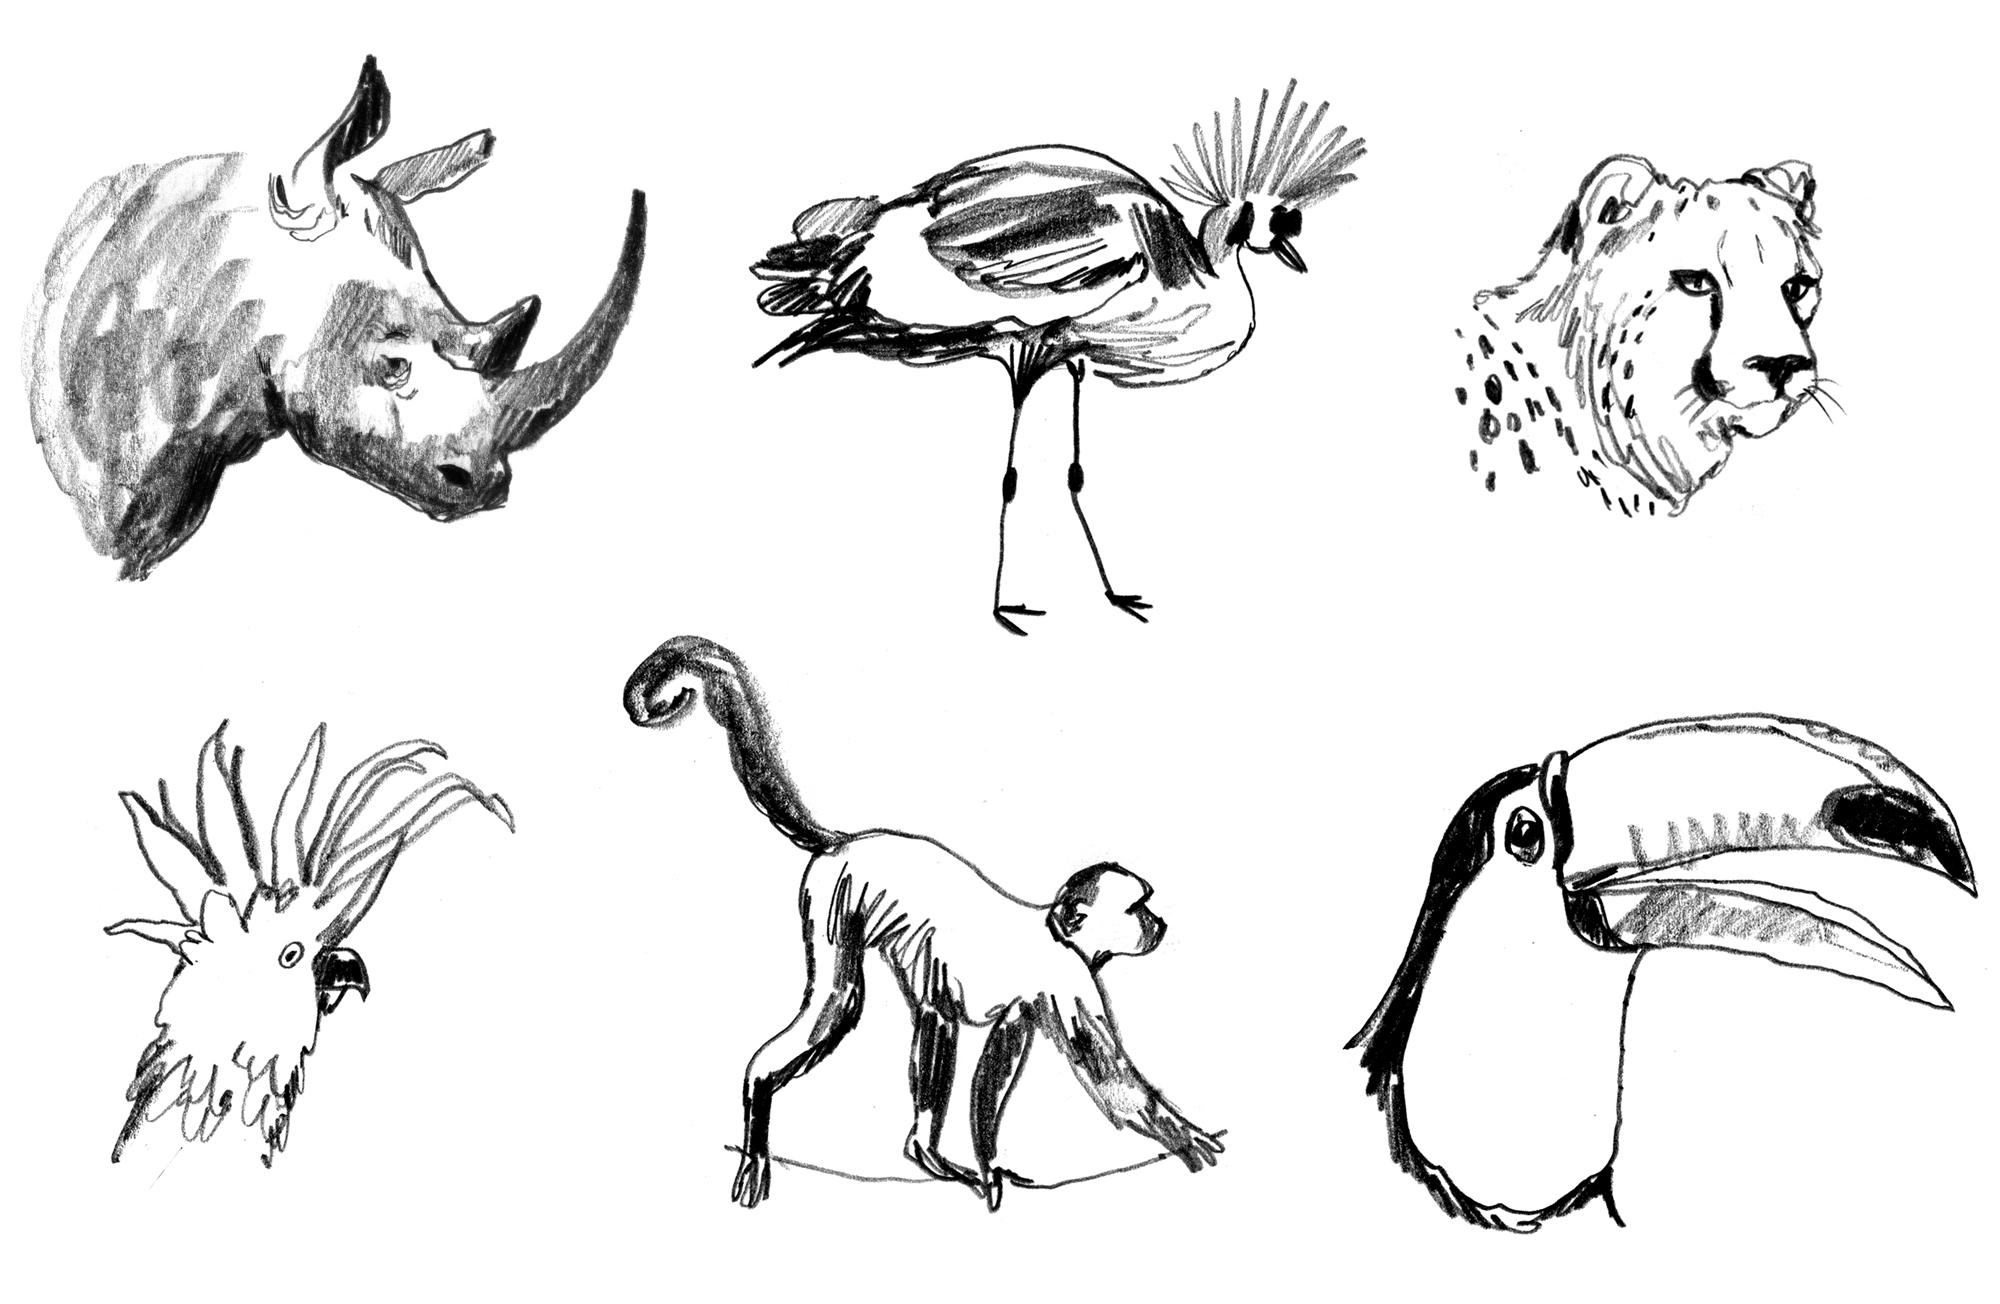 Unpublished Sketches